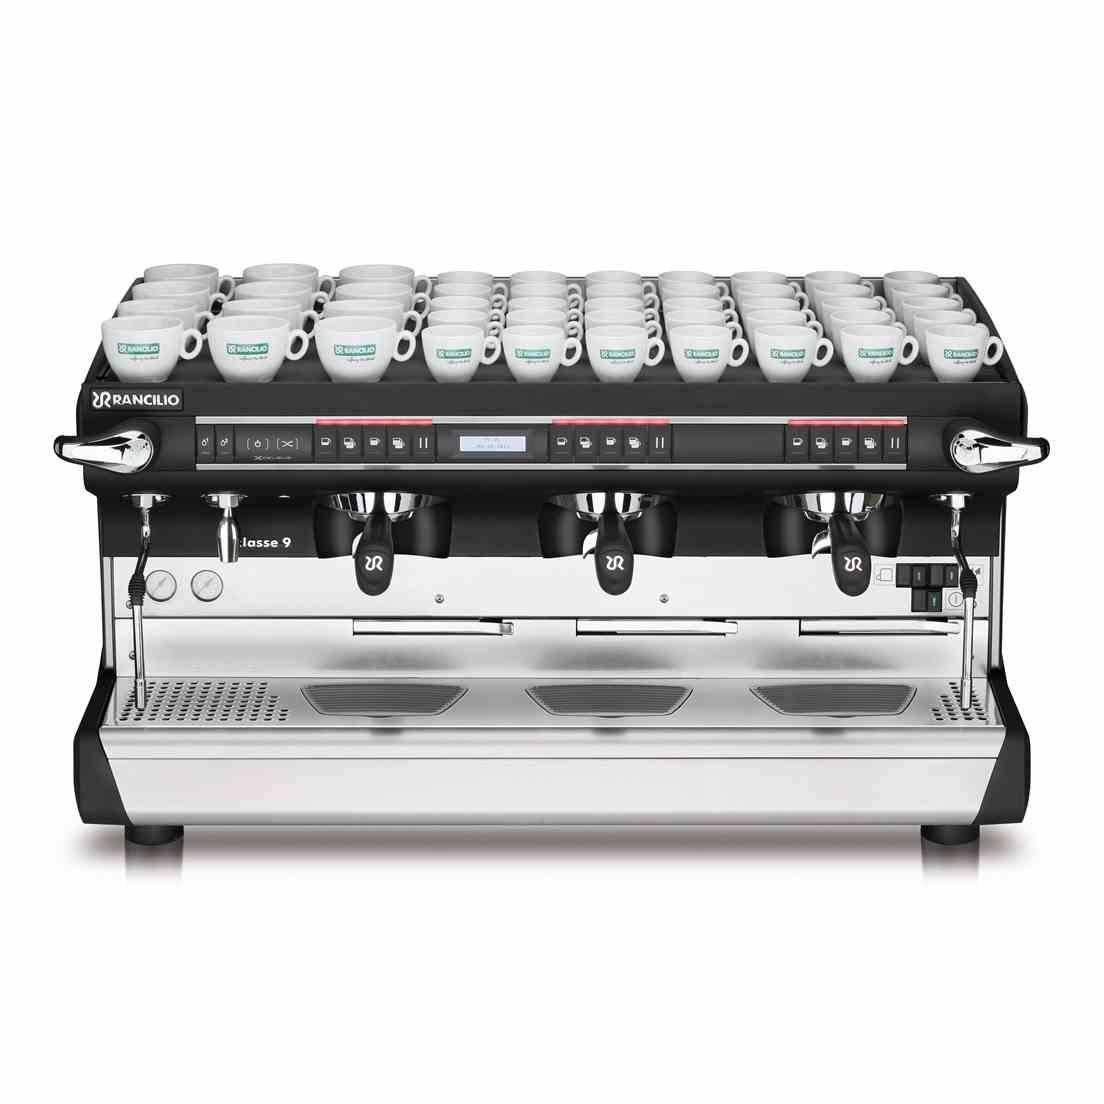 Maccina caffè professionale Rancilio CLASSE 9 USB XCELSIUS TALL,3 gruppi